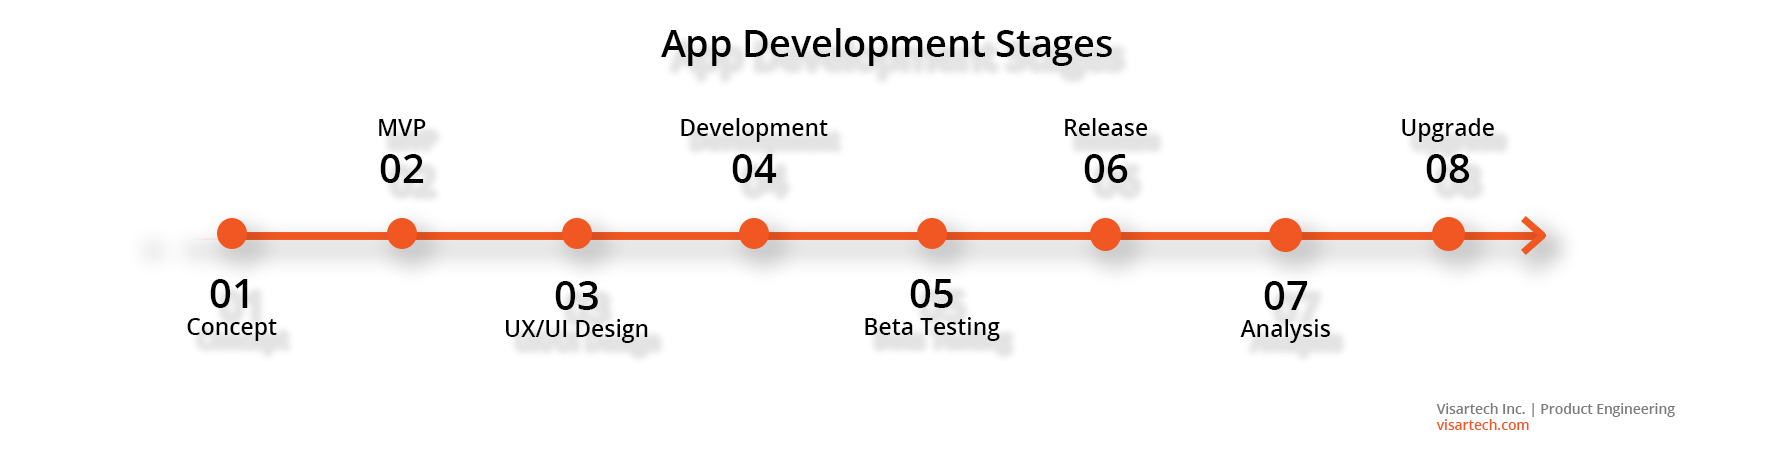 App Development Stages - Visartech Blog